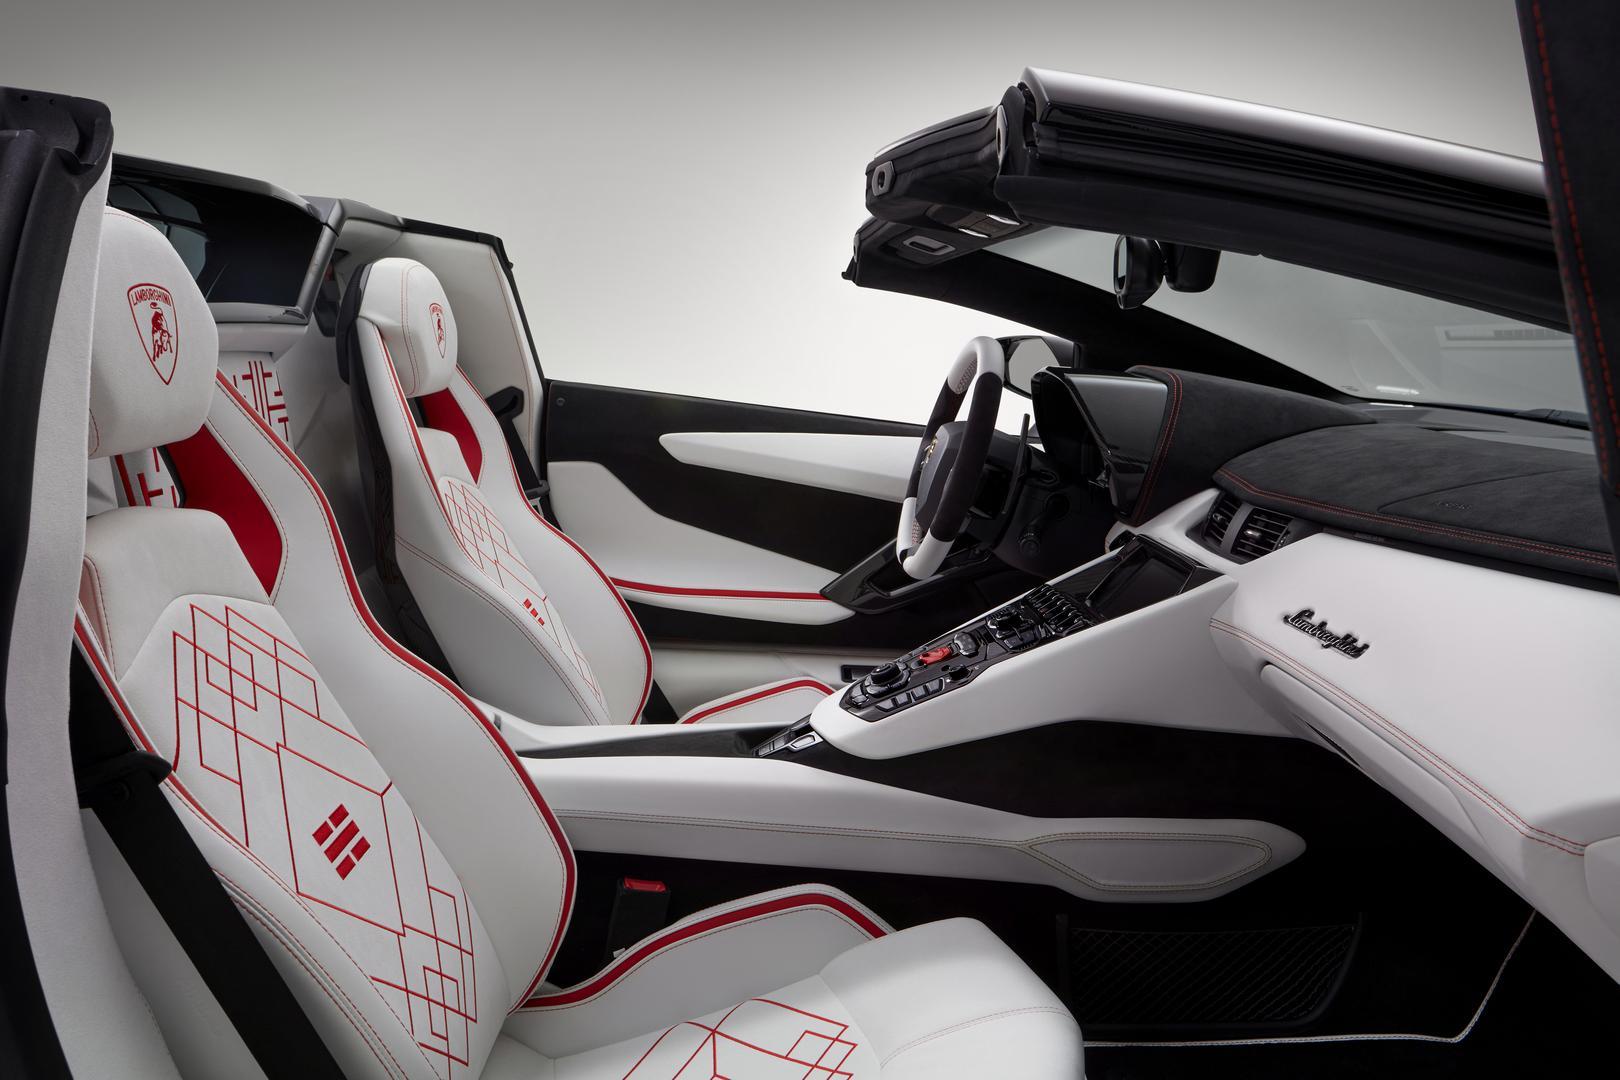 Aventador S Roadster interior